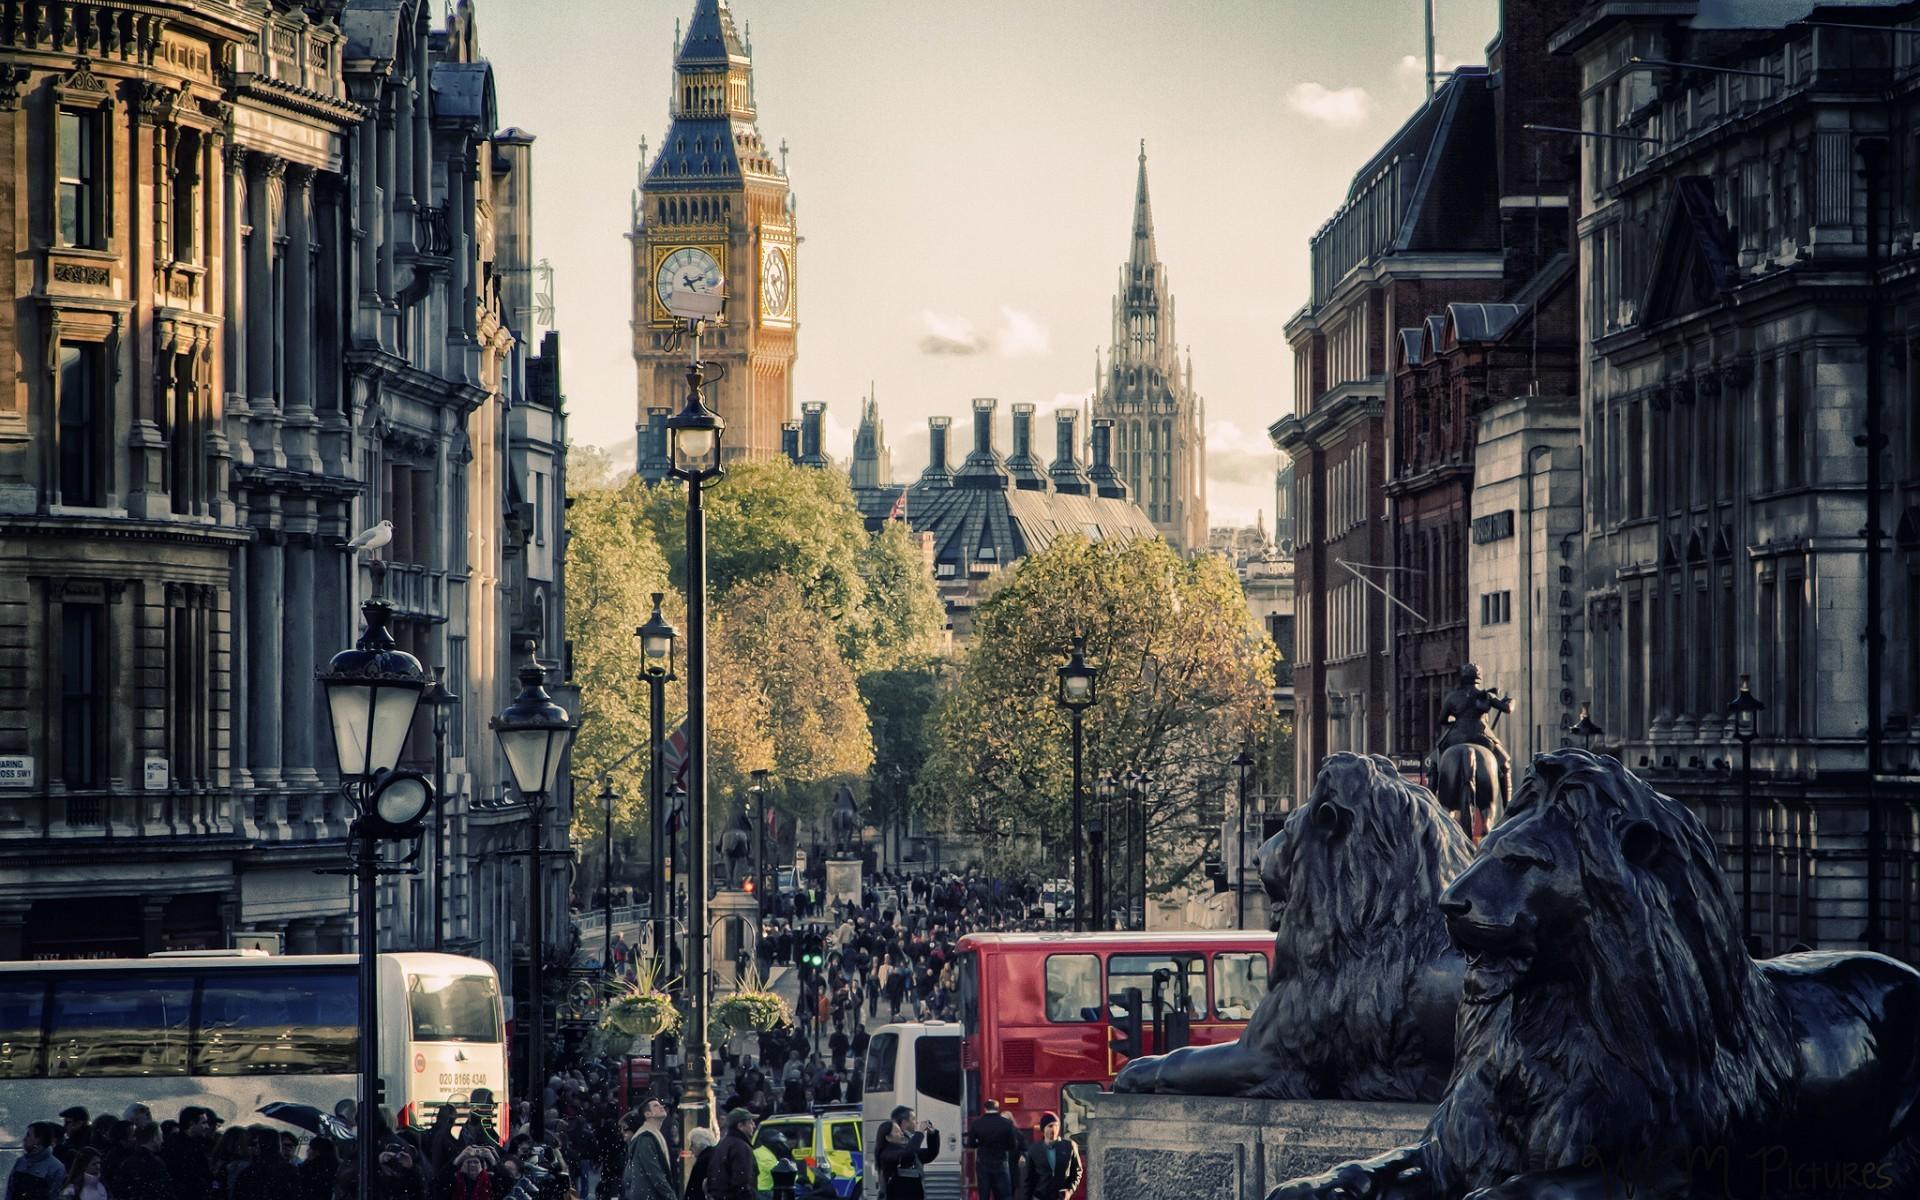 England London Big Ben United Kingdom cities wallpaper 1920x1200